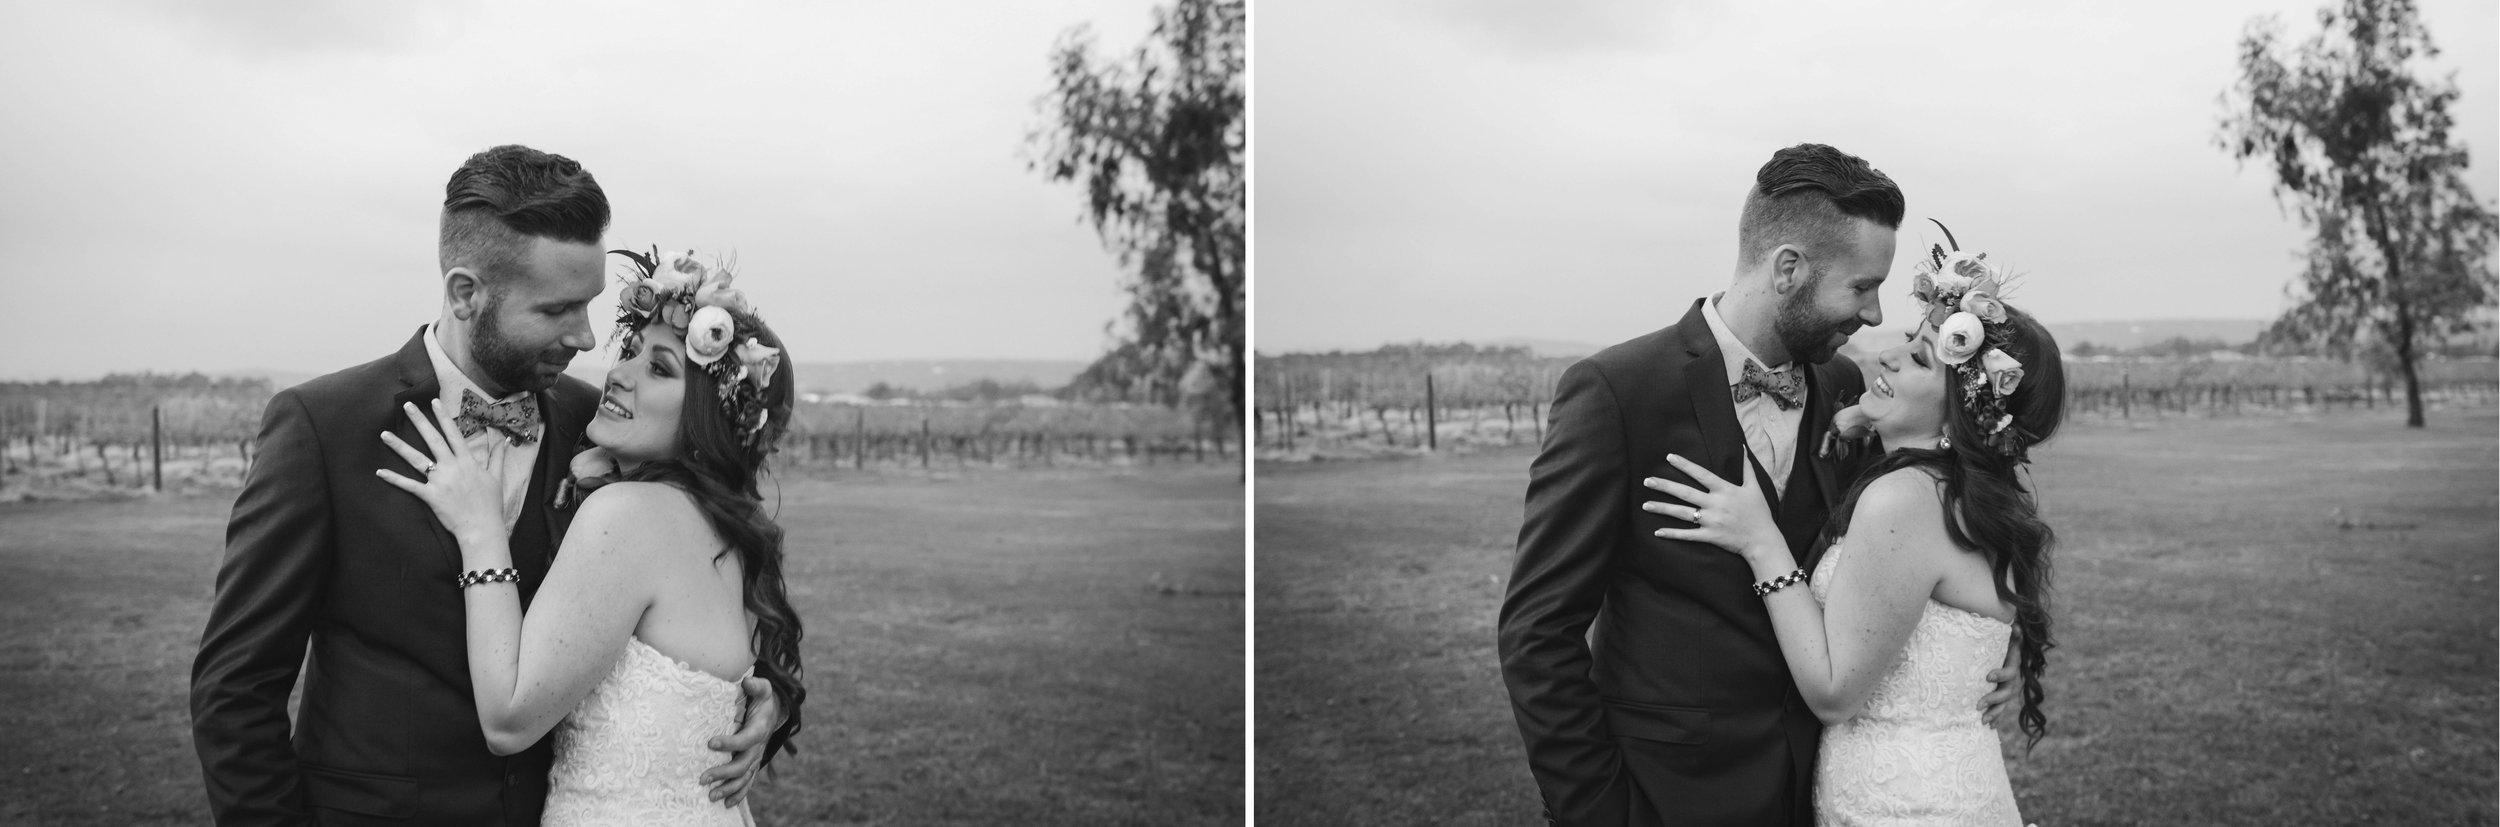 WA Ballet Centre Swan Valley Oakover Grounds Perth Wheatbelt Avon Valley Wedding Photographer (59).jpg